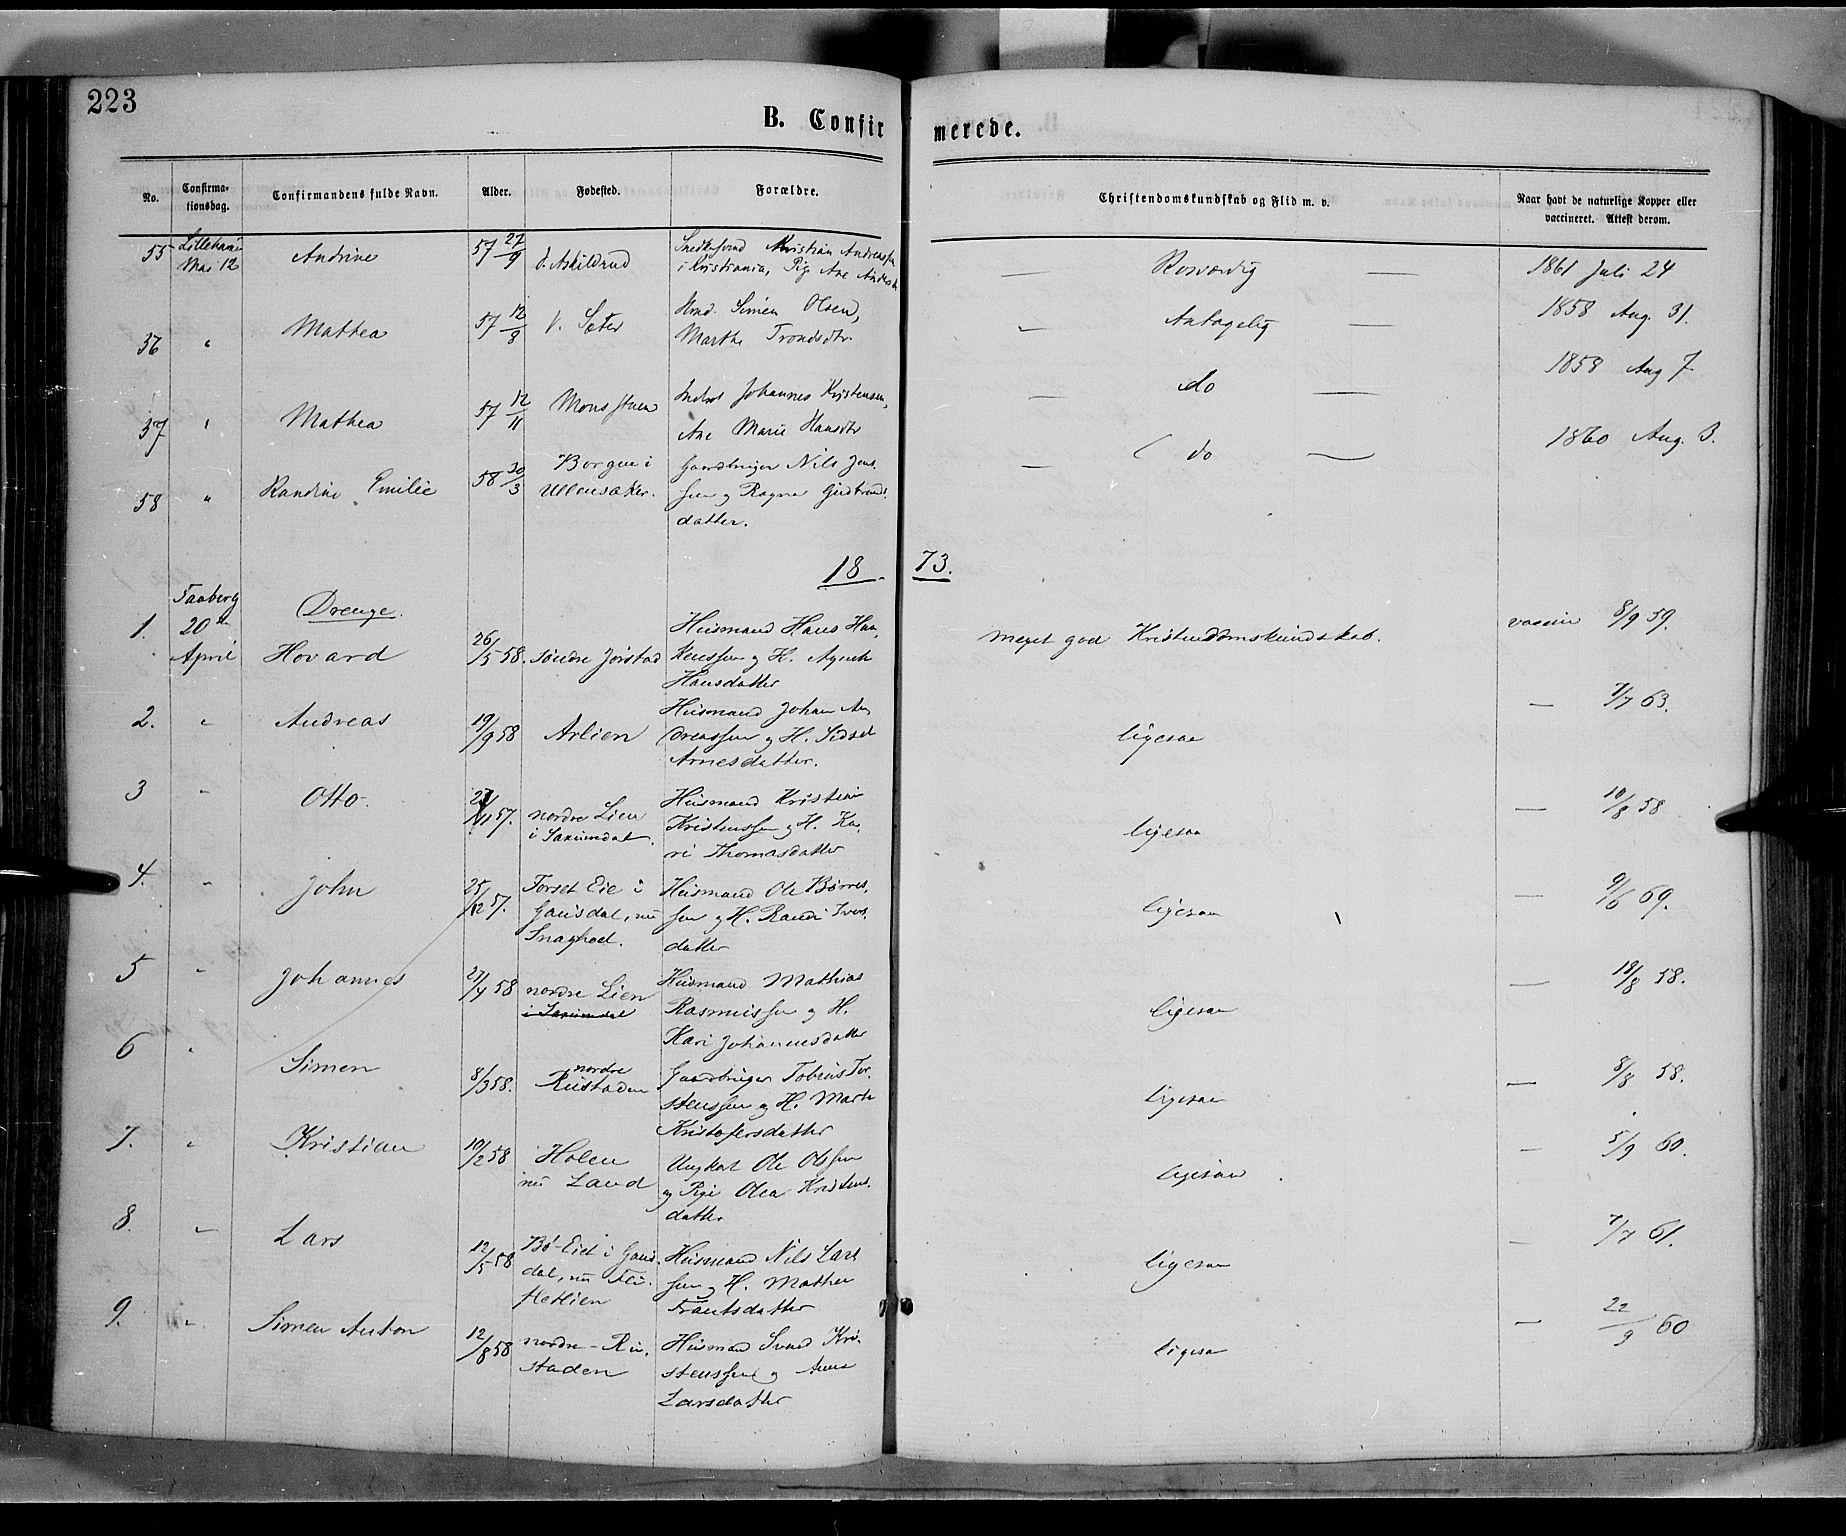 SAH, Fåberg prestekontor, Ministerialbok nr. 7, 1868-1878, s. 223